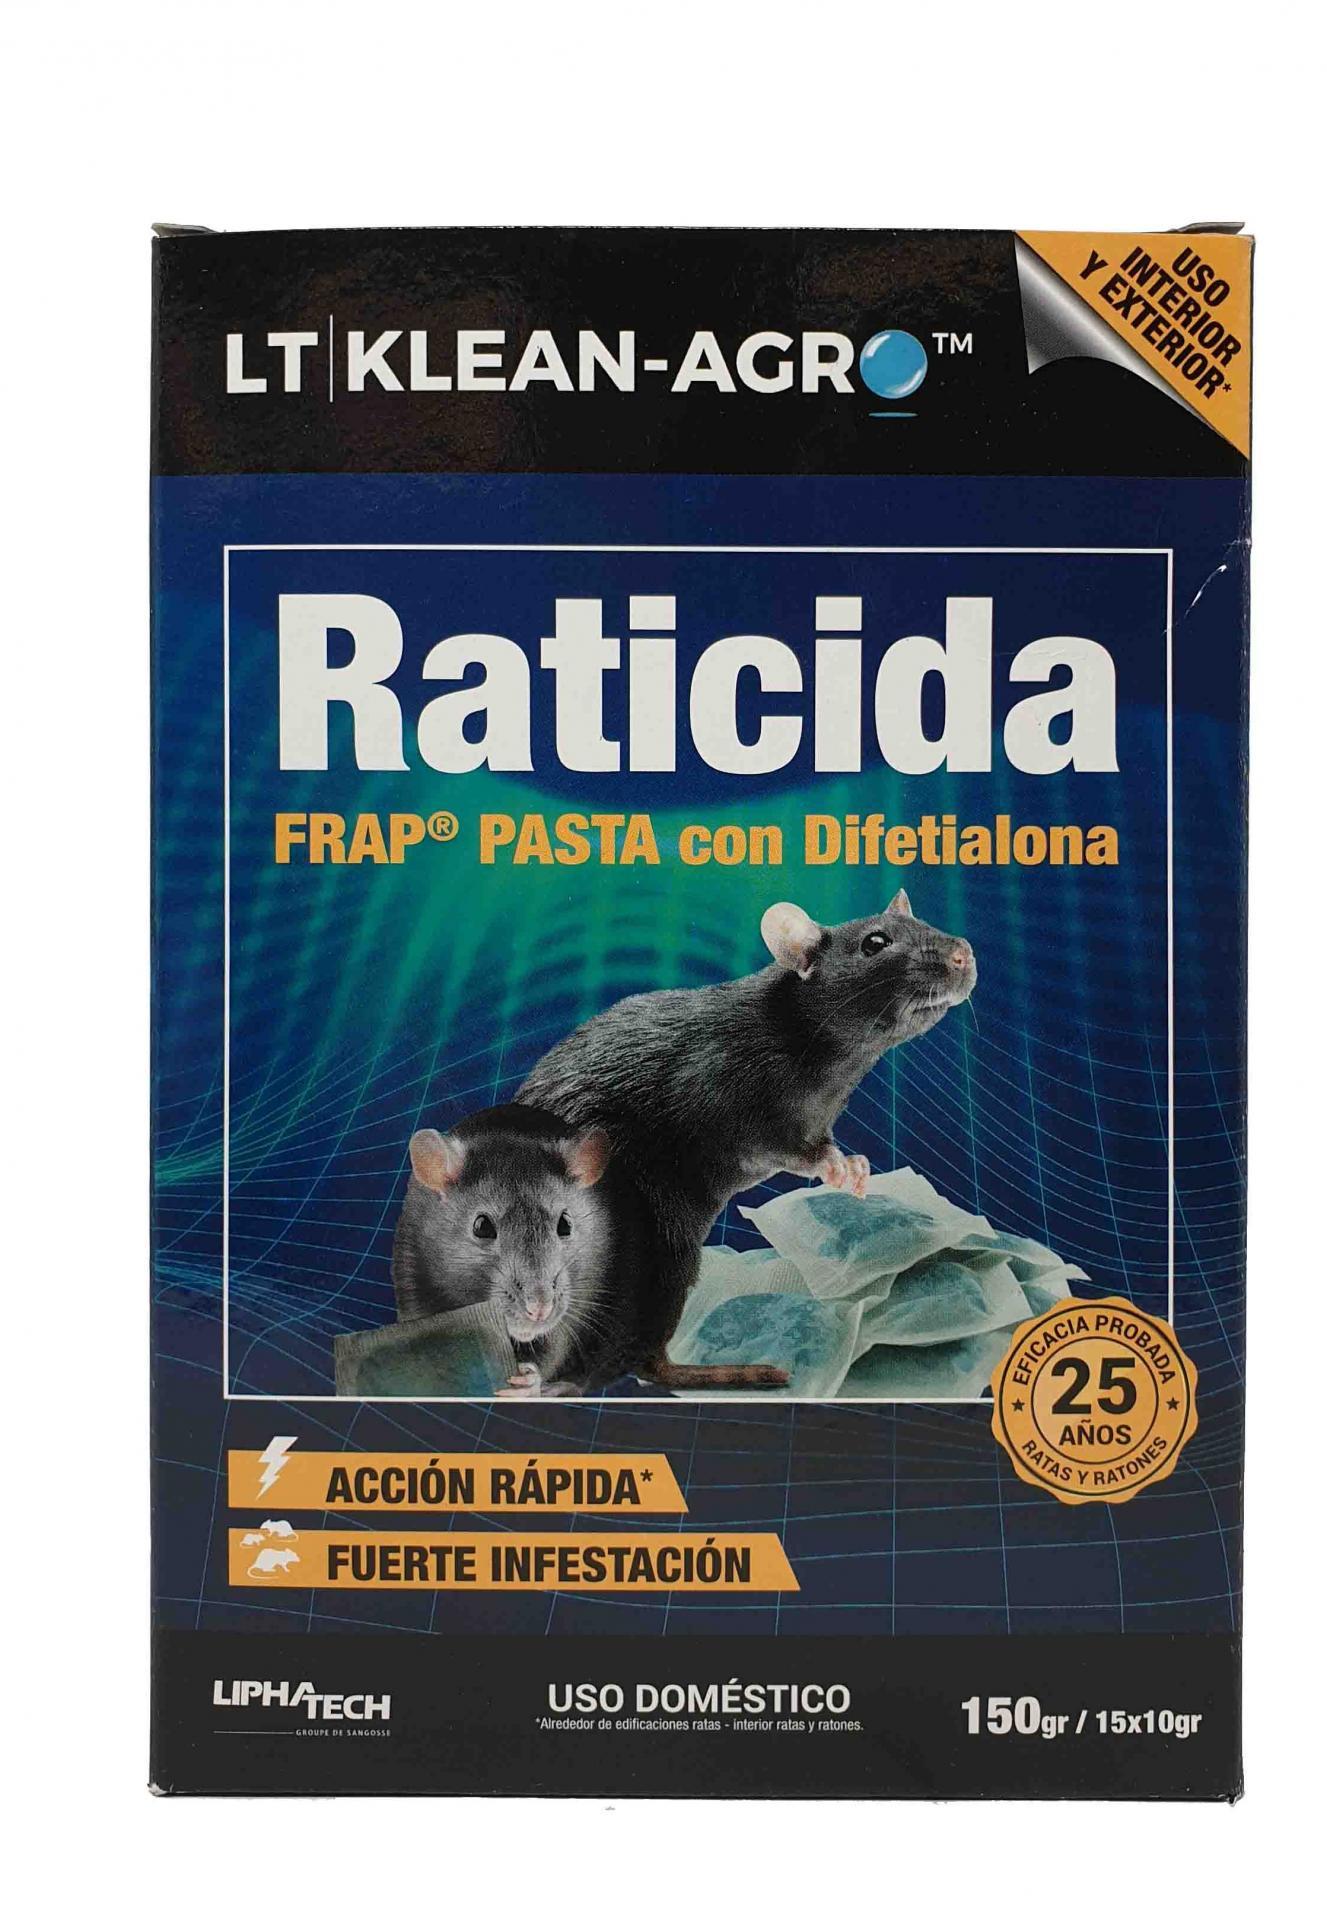 Raticida PLT KLEAN Pasta fresca bolsita . Caja 150 gr.